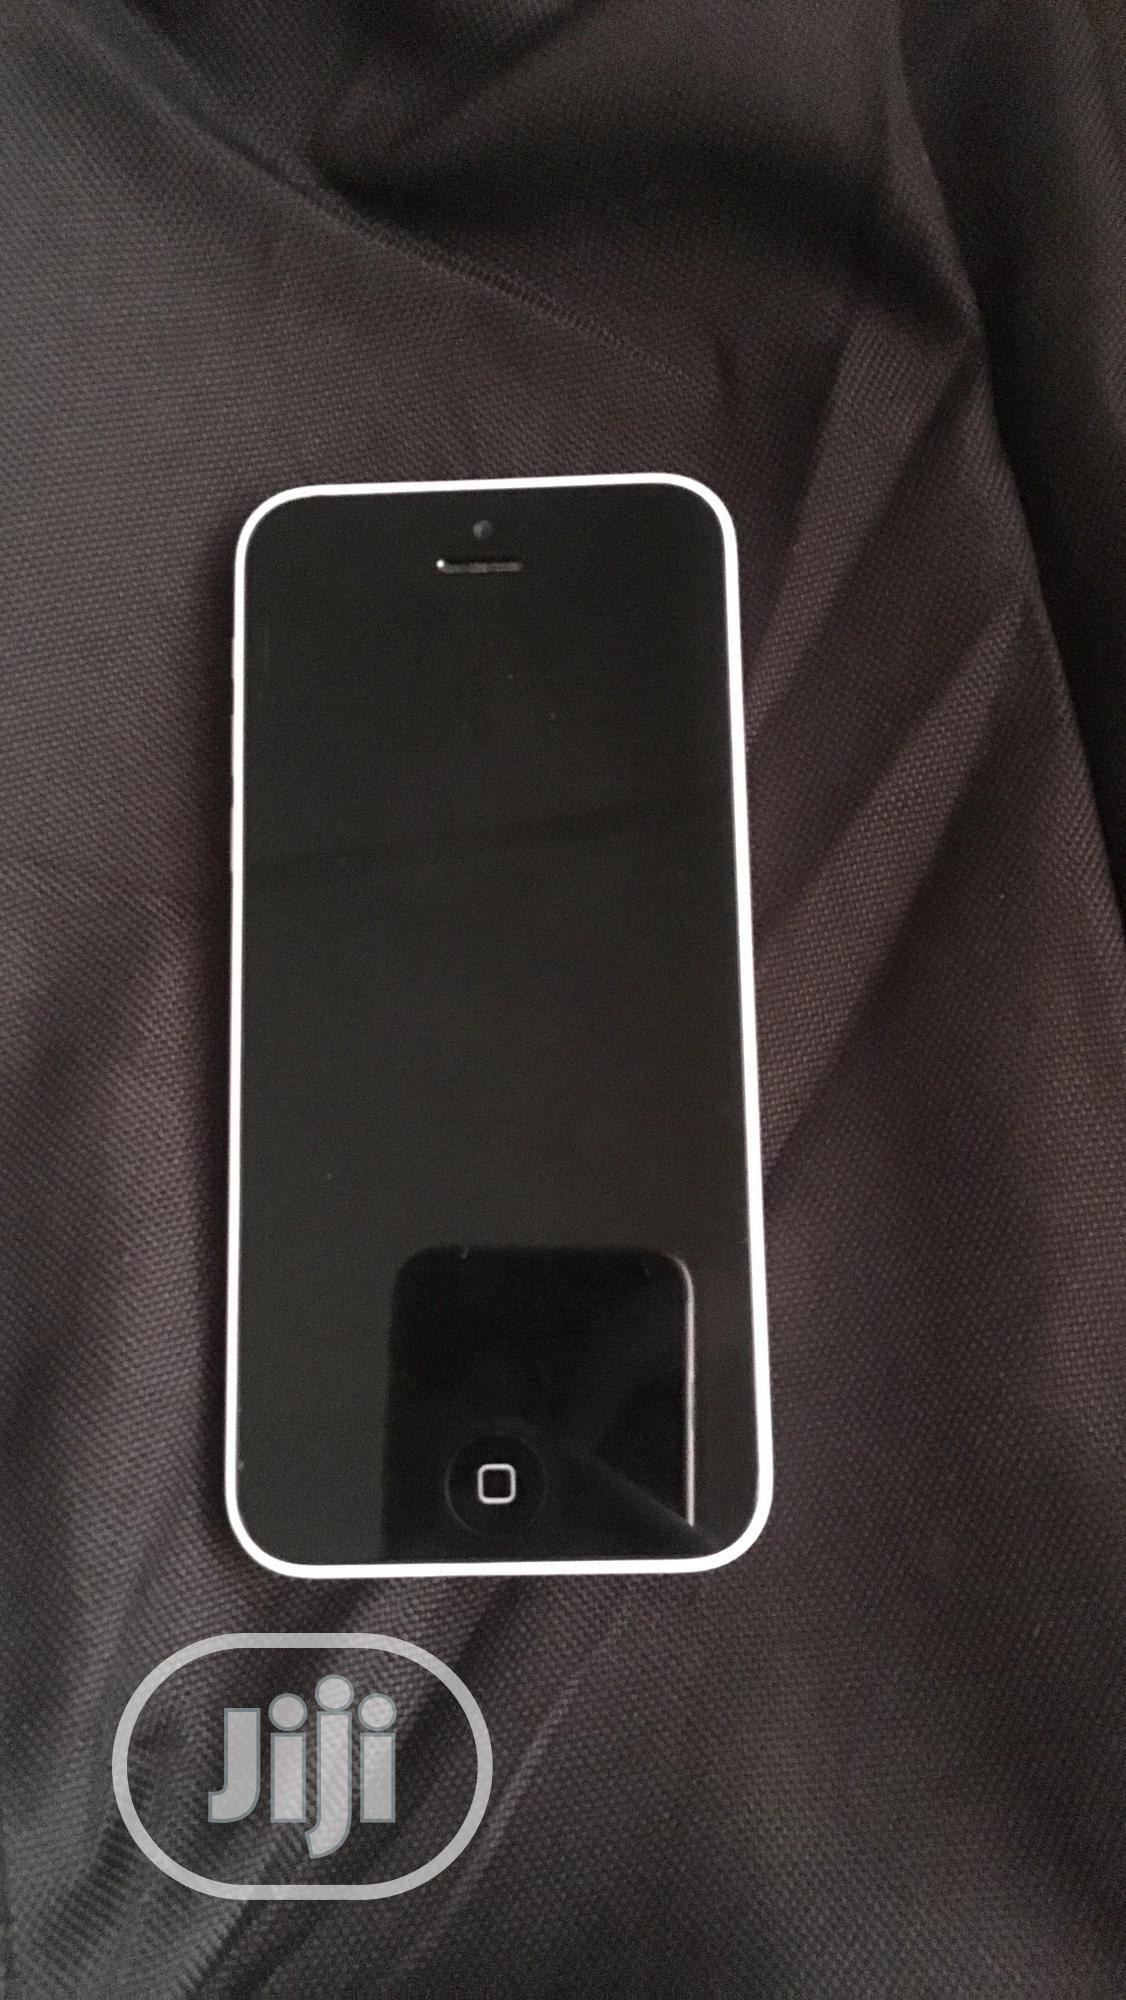 Archive: Apple iPhone 5c 8 GB White